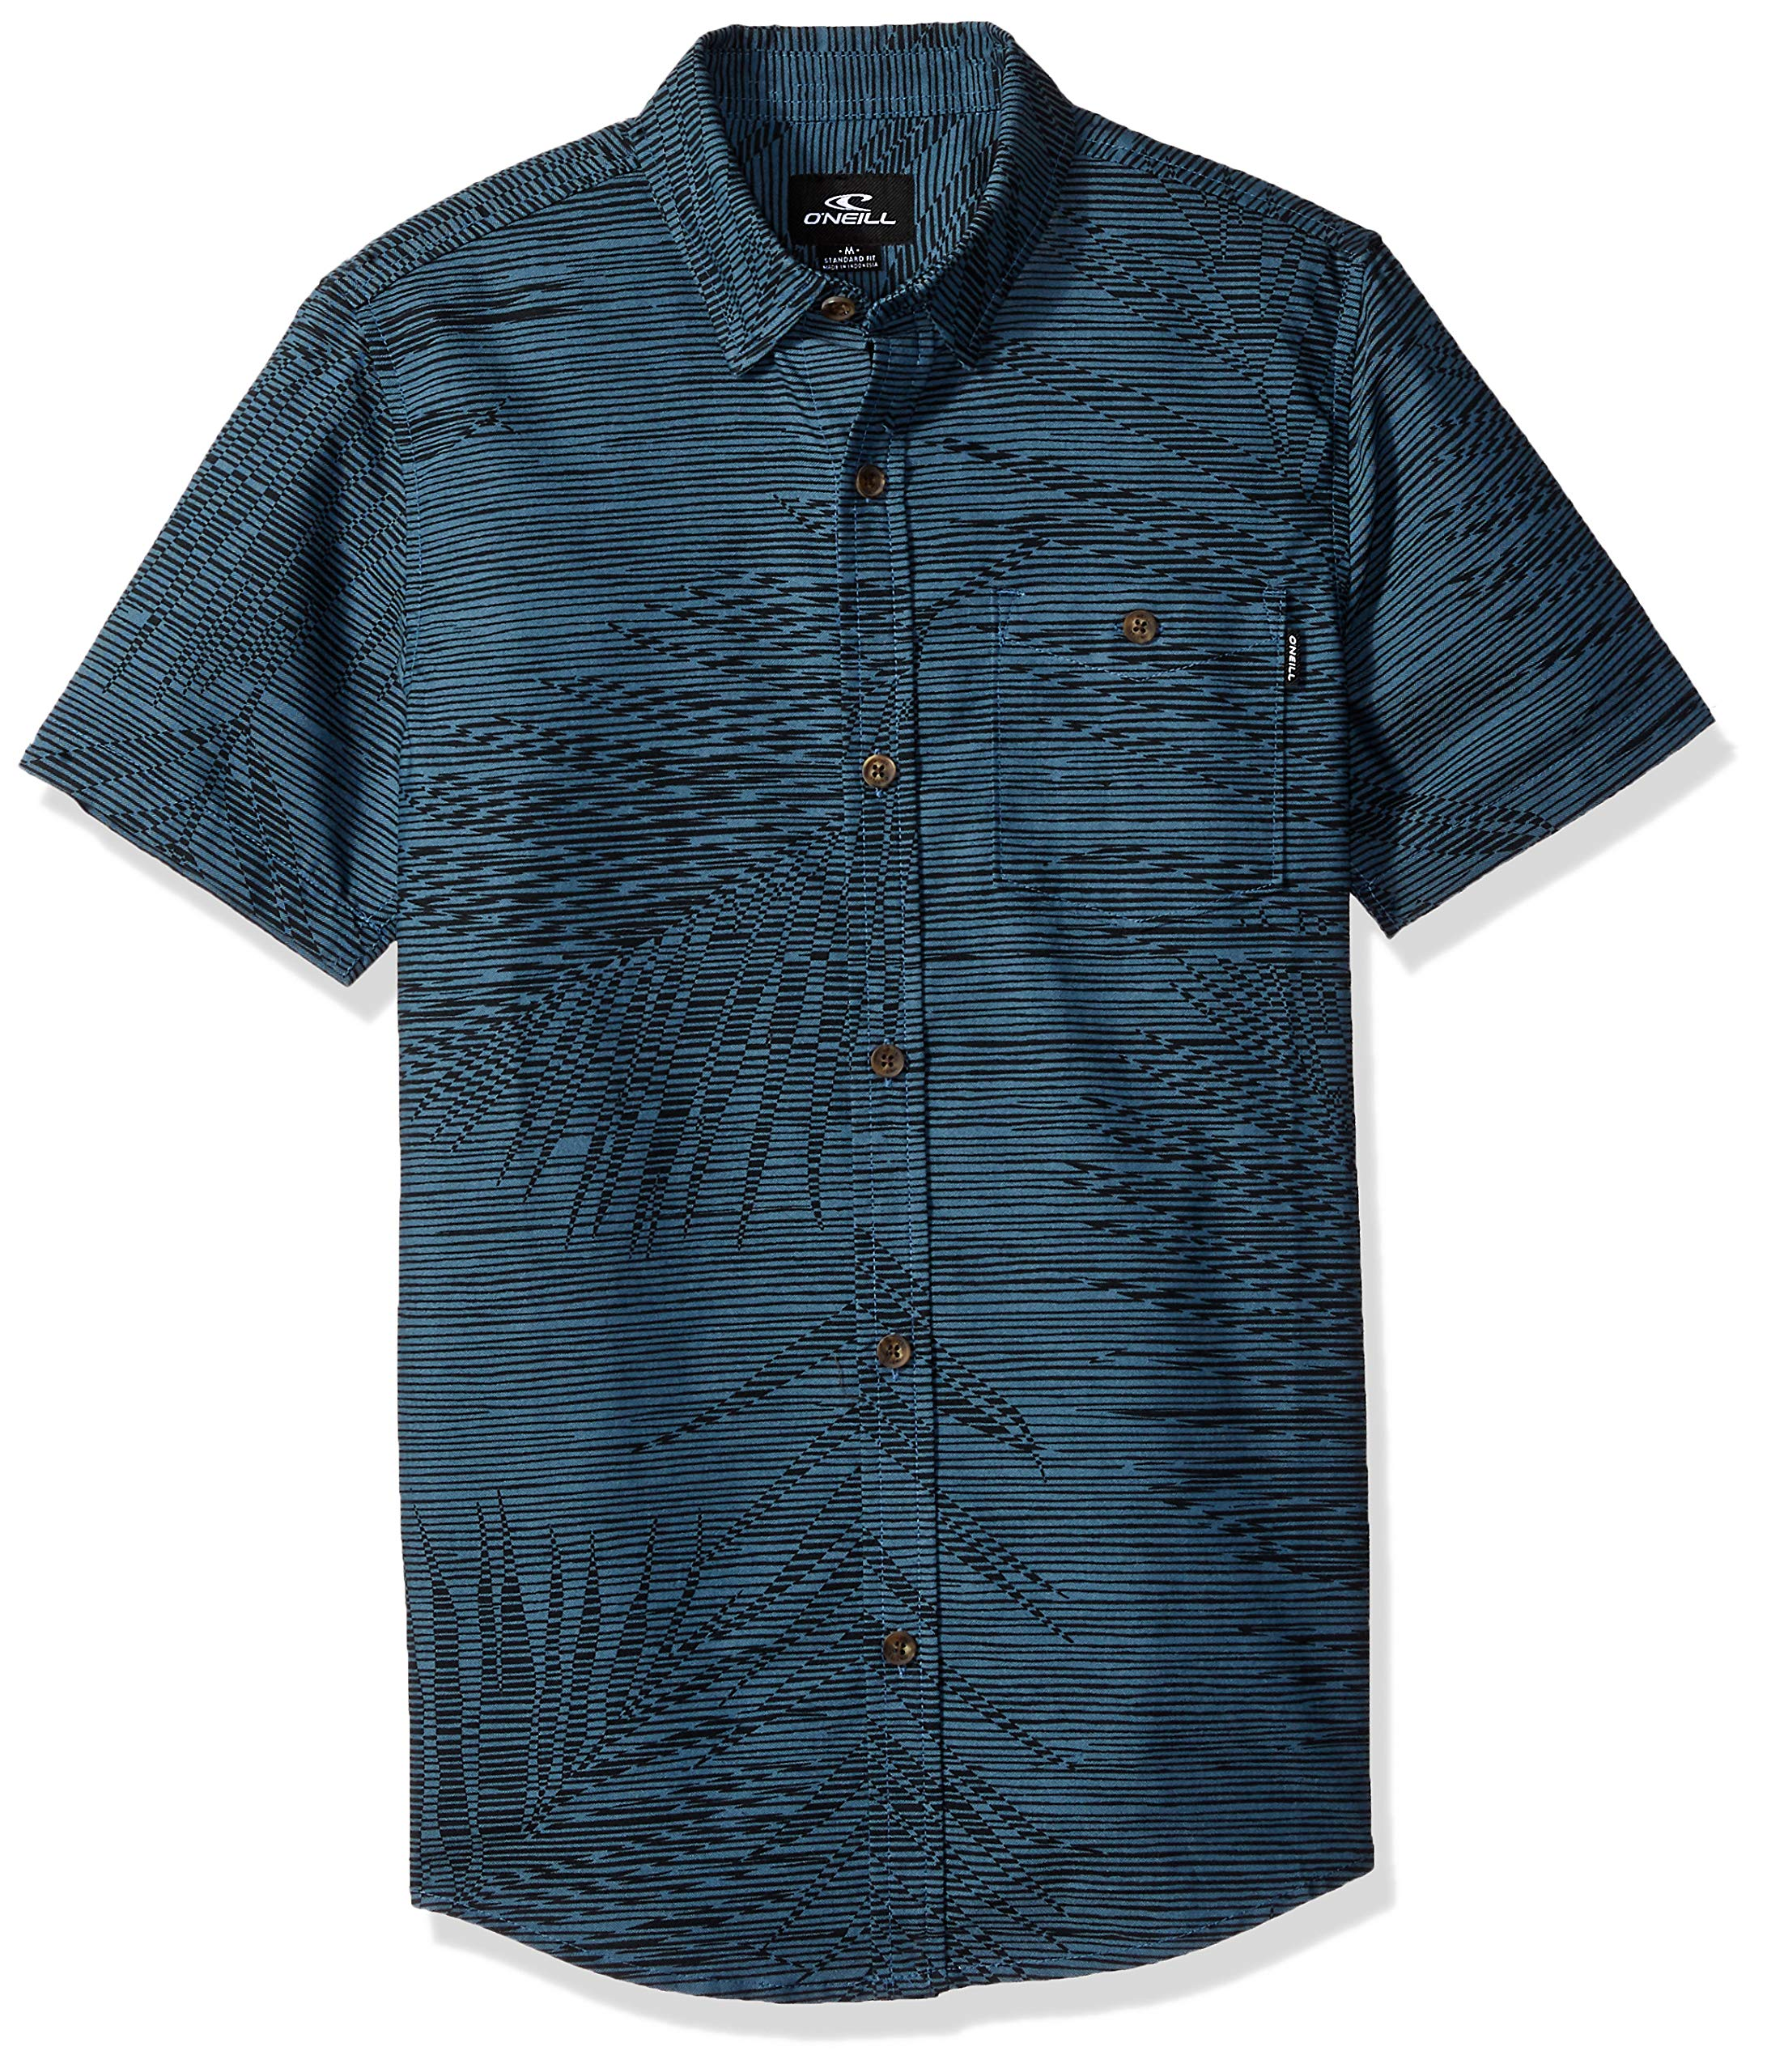 O'Neill Boys' Big Fronzarelli Short Sleeve Woven, Dark Blue, L